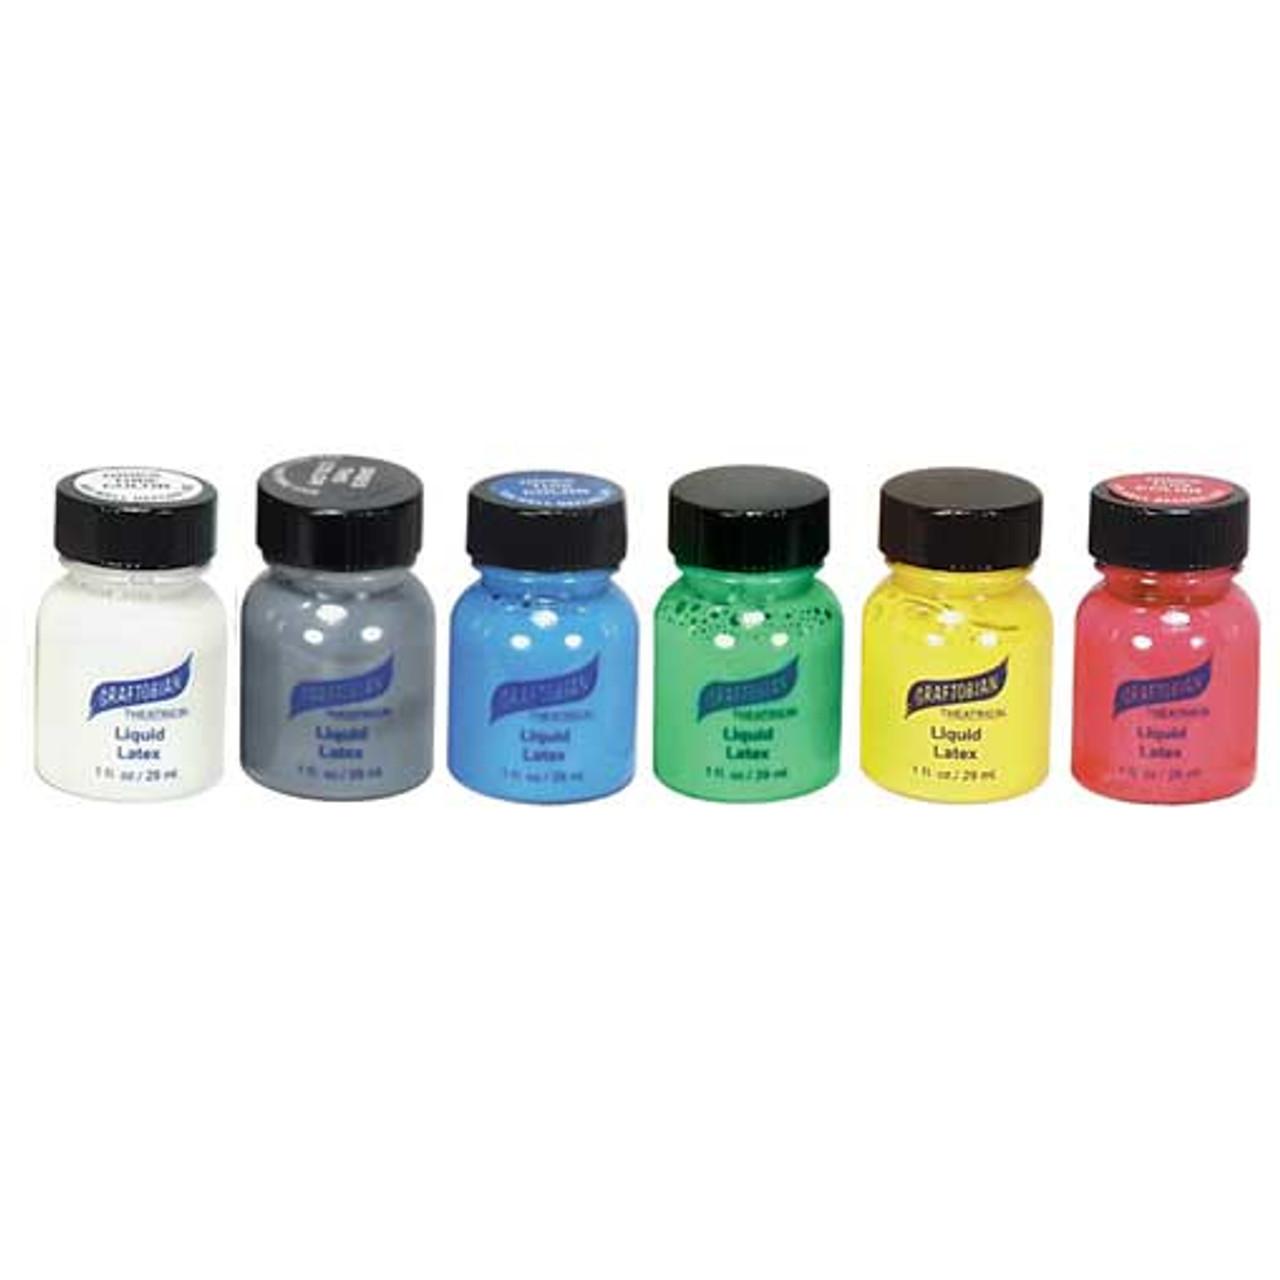 Graftobian Colored Liquid Latex, 1 oz | Professional Effects Makeup ...